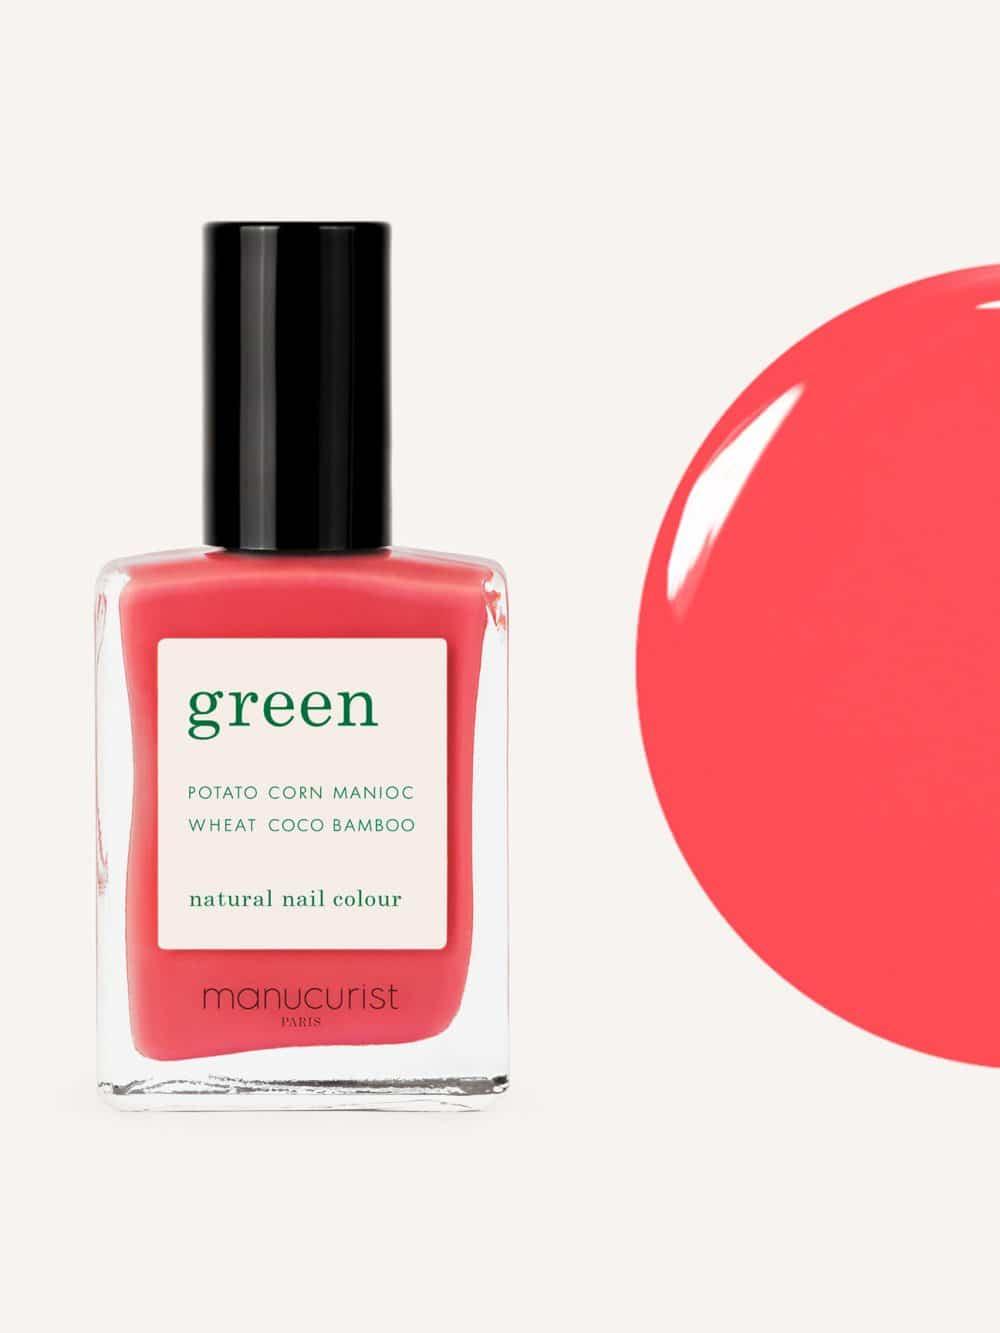 vernis à ongles bio green de la marque Manucurist made in france de couleur rose azalea